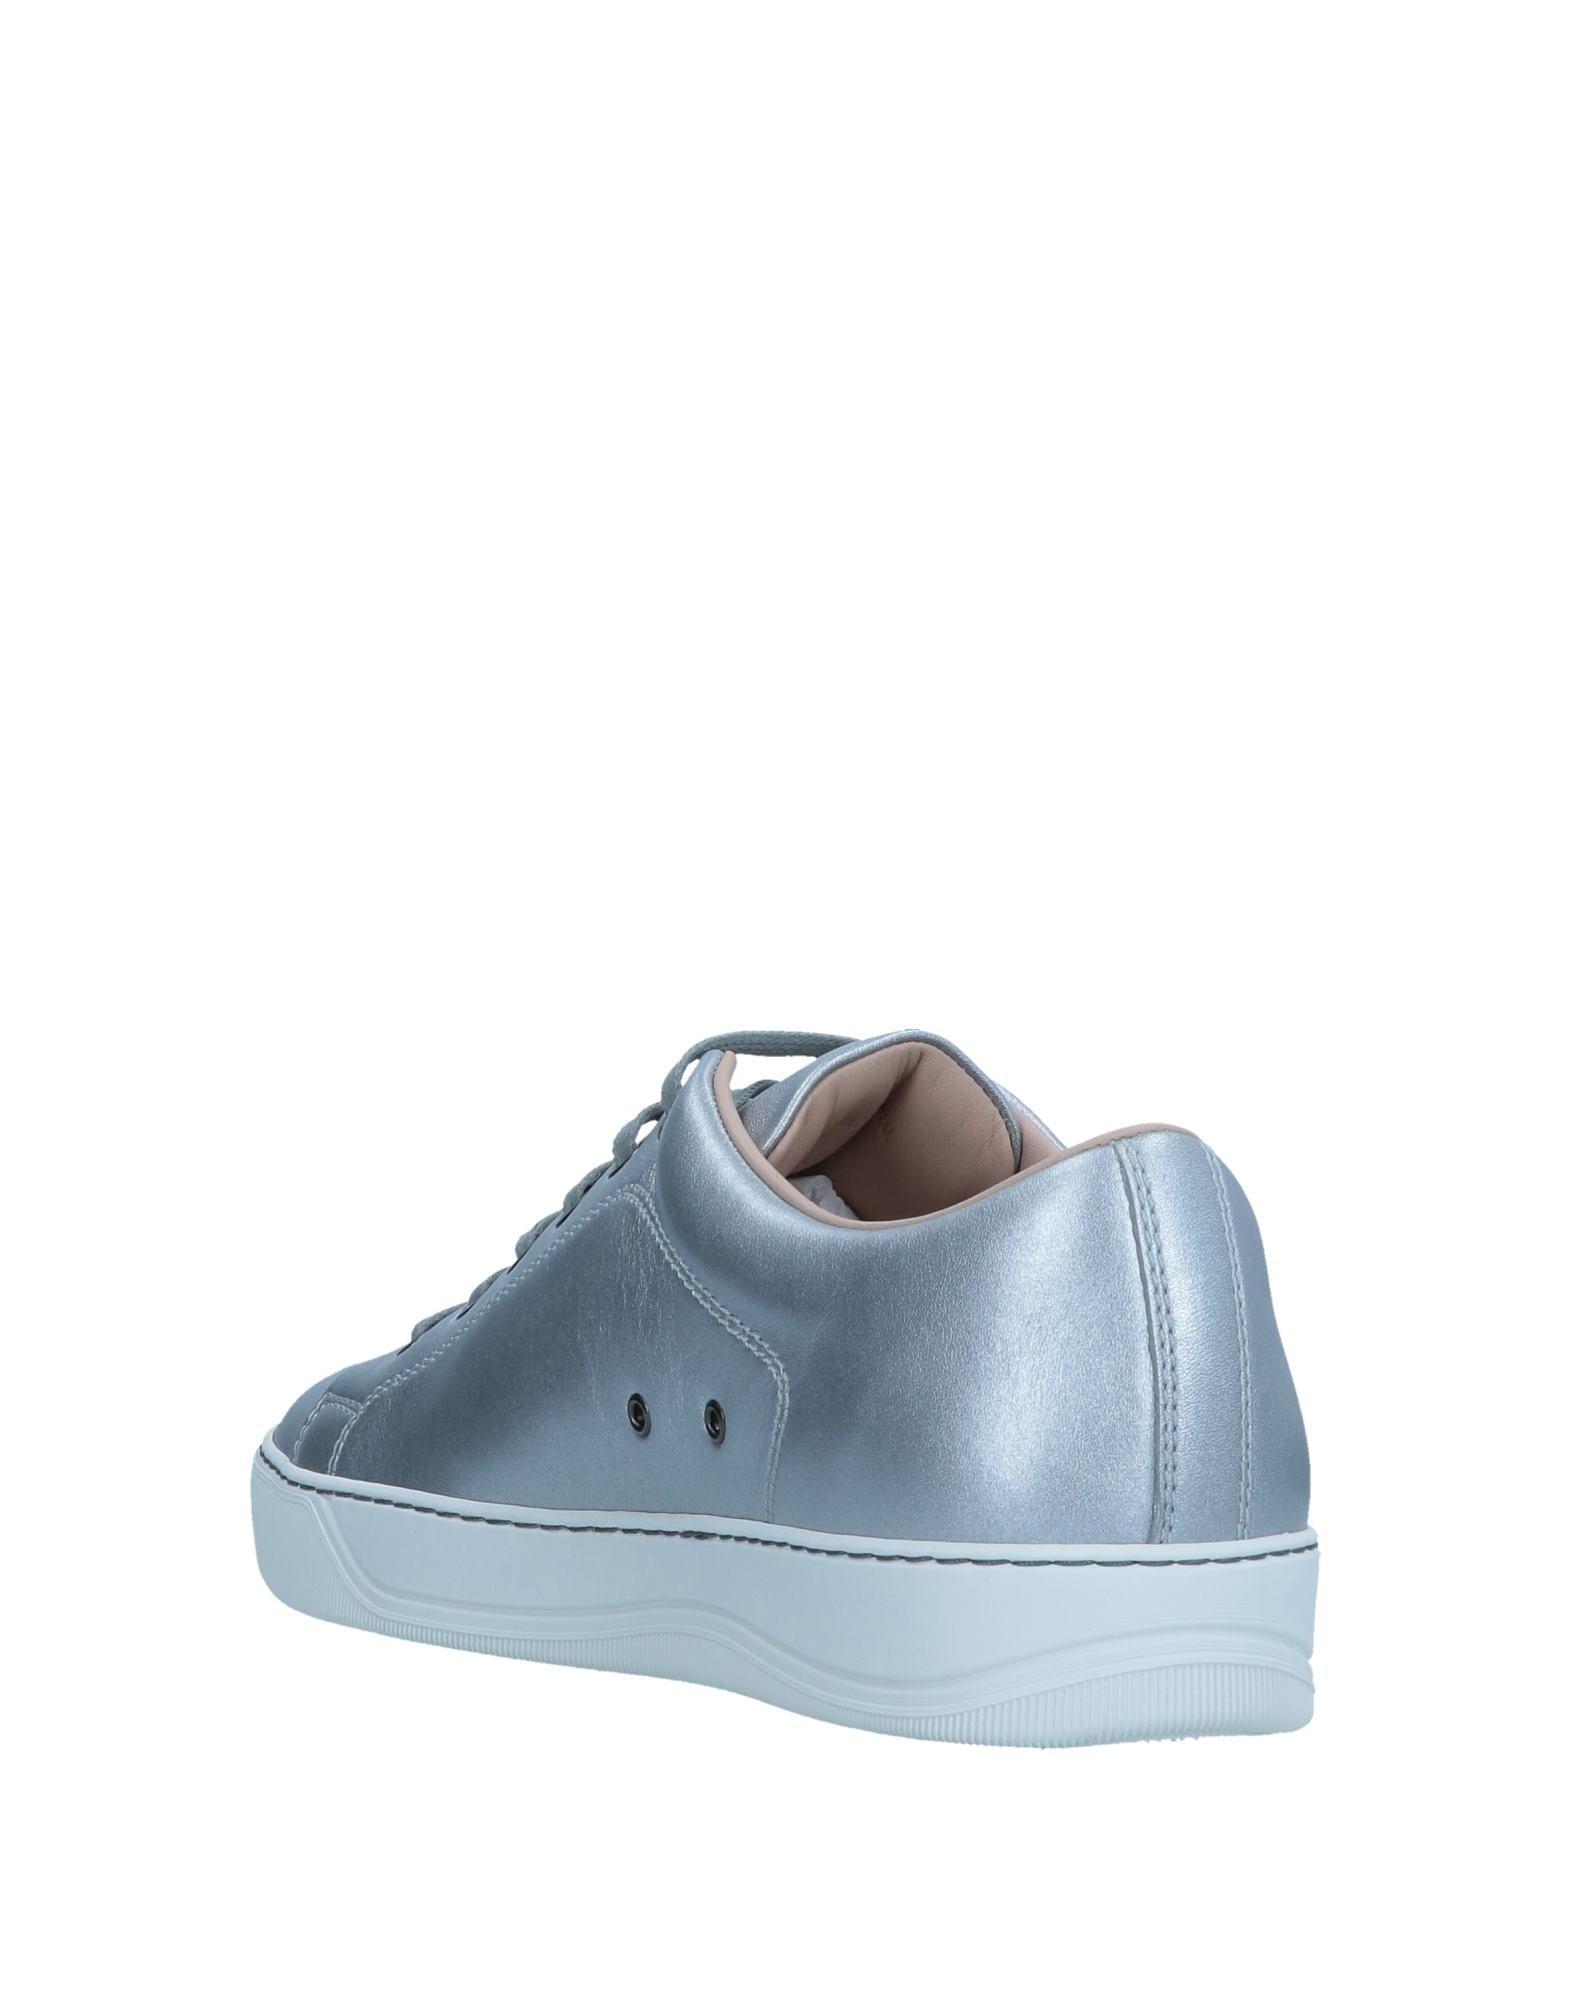 Lanvin Gute Sneakers Herren  11550265KV Gute Lanvin Qualität beliebte Schuhe c87245